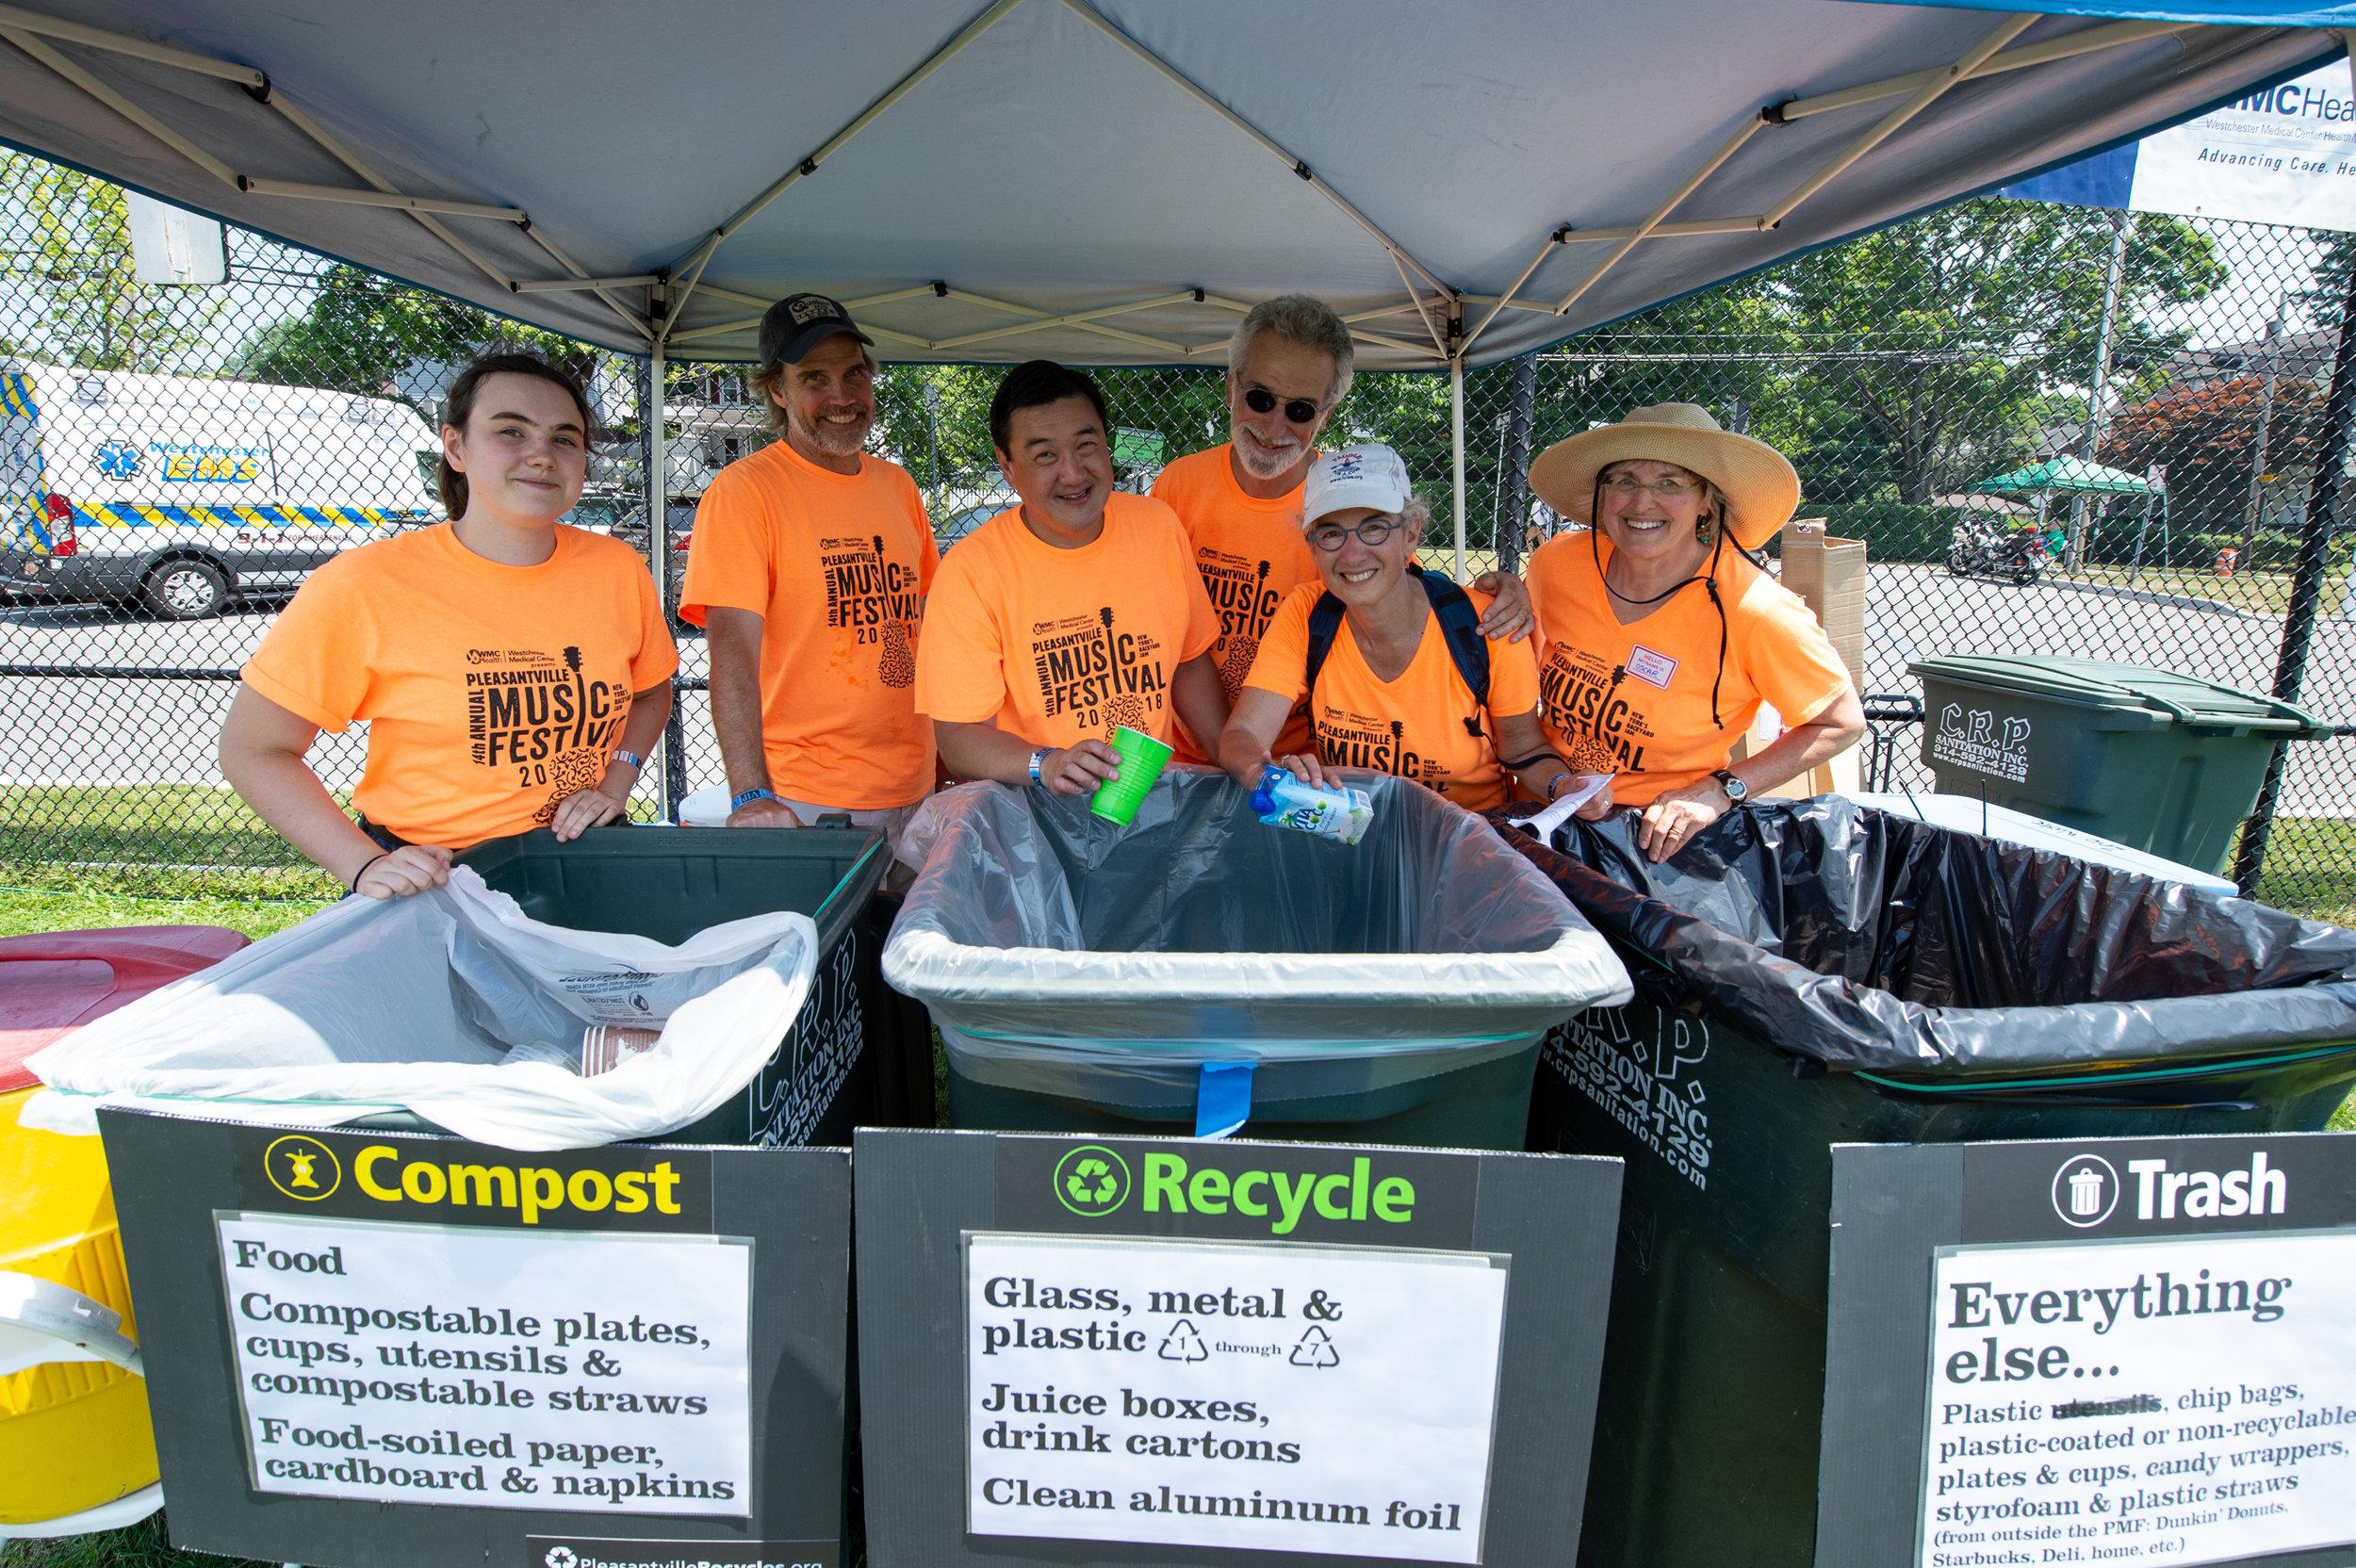 Our Zero Waste team keeping it Earth-friendly © 2018 Lynda Shenkman